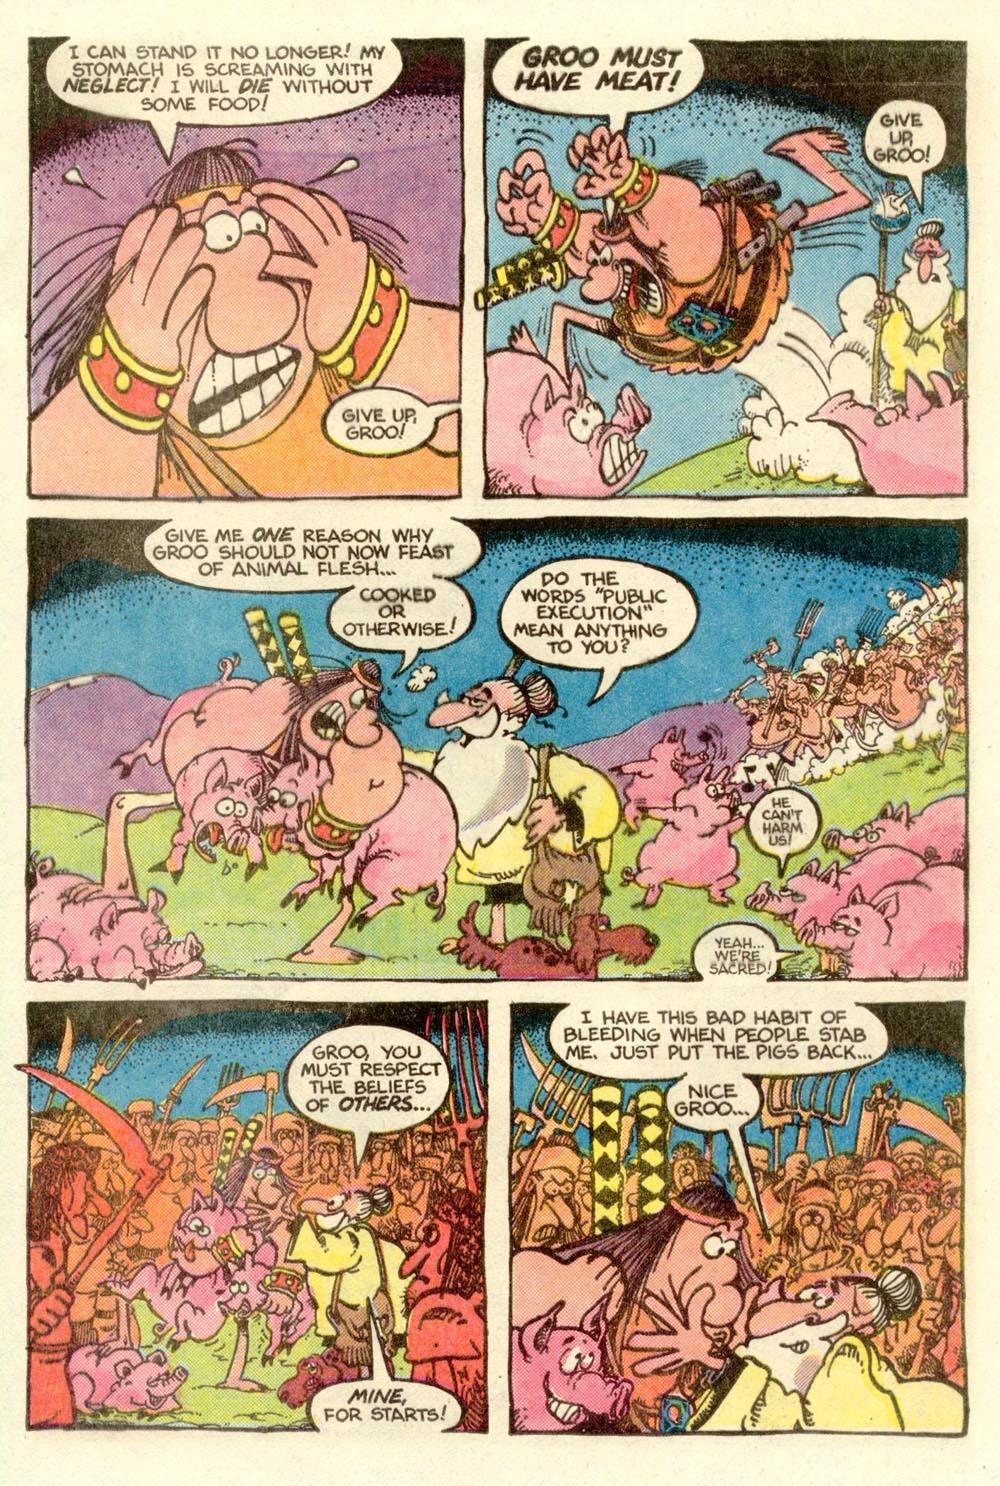 Read online Sergio Aragonés Groo the Wanderer comic -  Issue #9 - 11